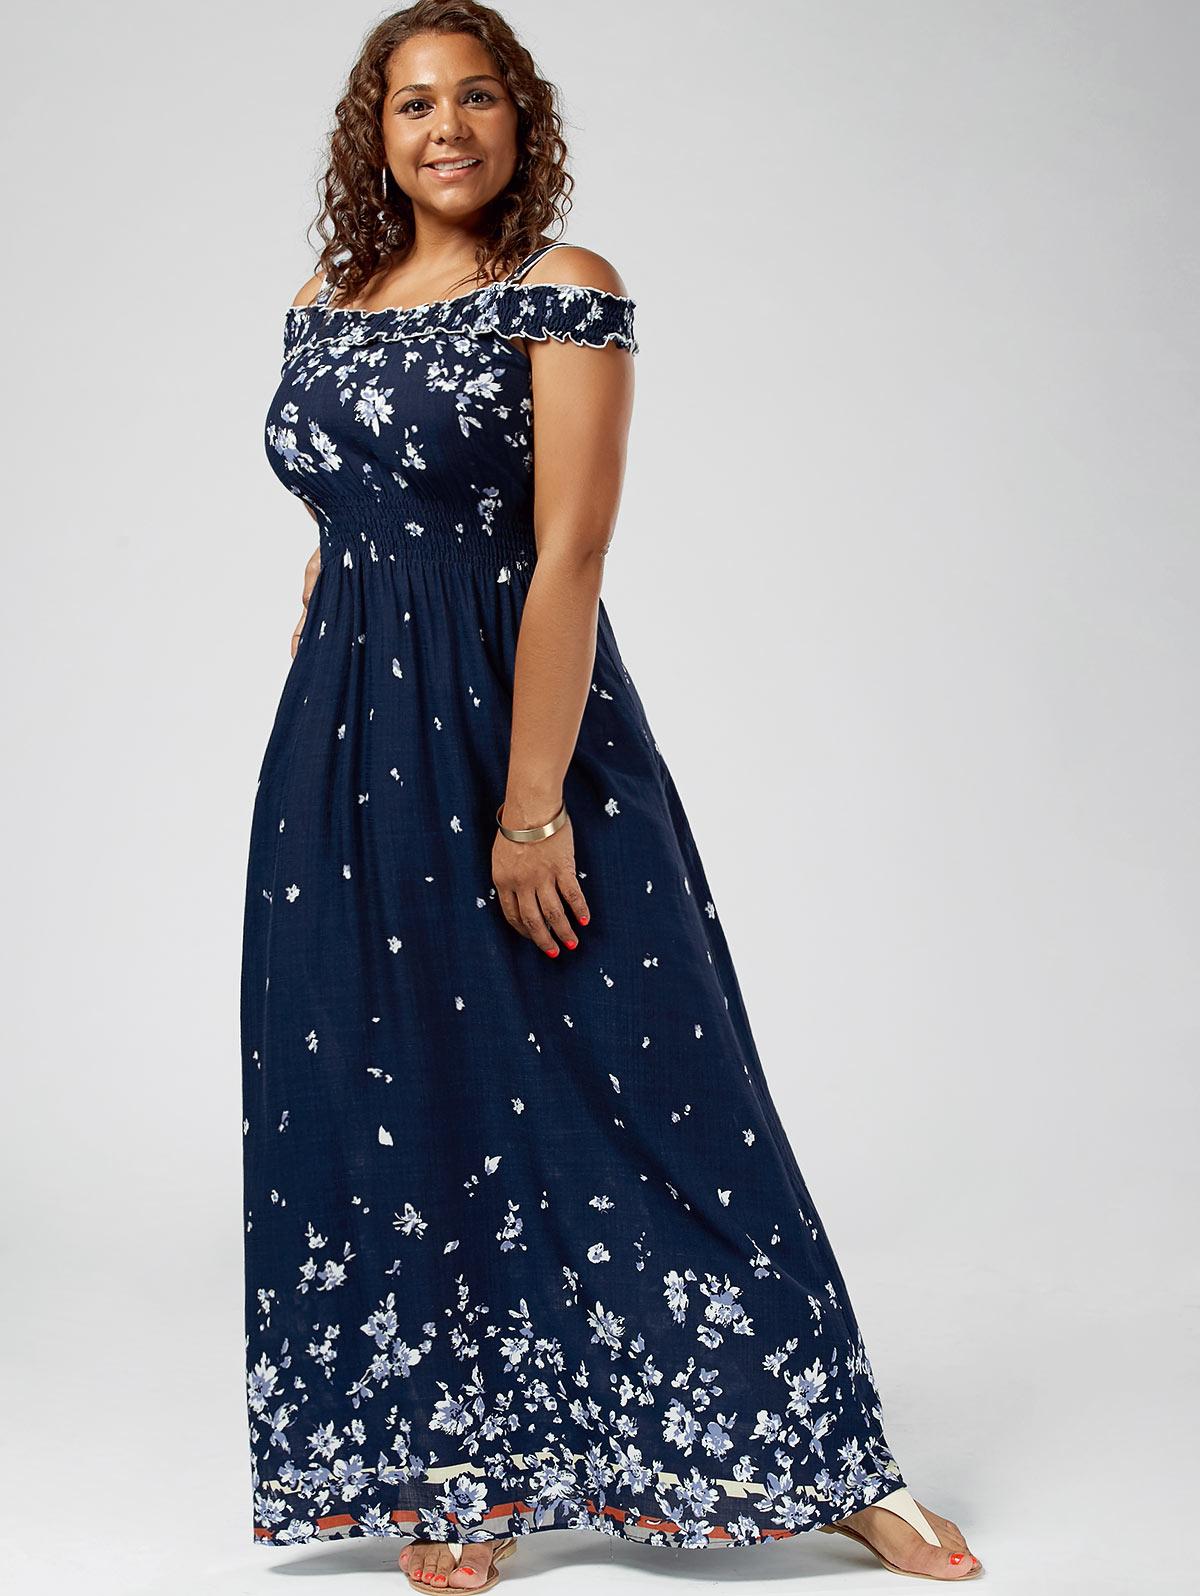 US $15.83 52% OFF Wipalo Women Bohemian Summer Plus Size 5XL Floral Print  Cold Shoulder Maxi Dress Empire Waist Short Sleeves Long Dress Vestidos-in  ...